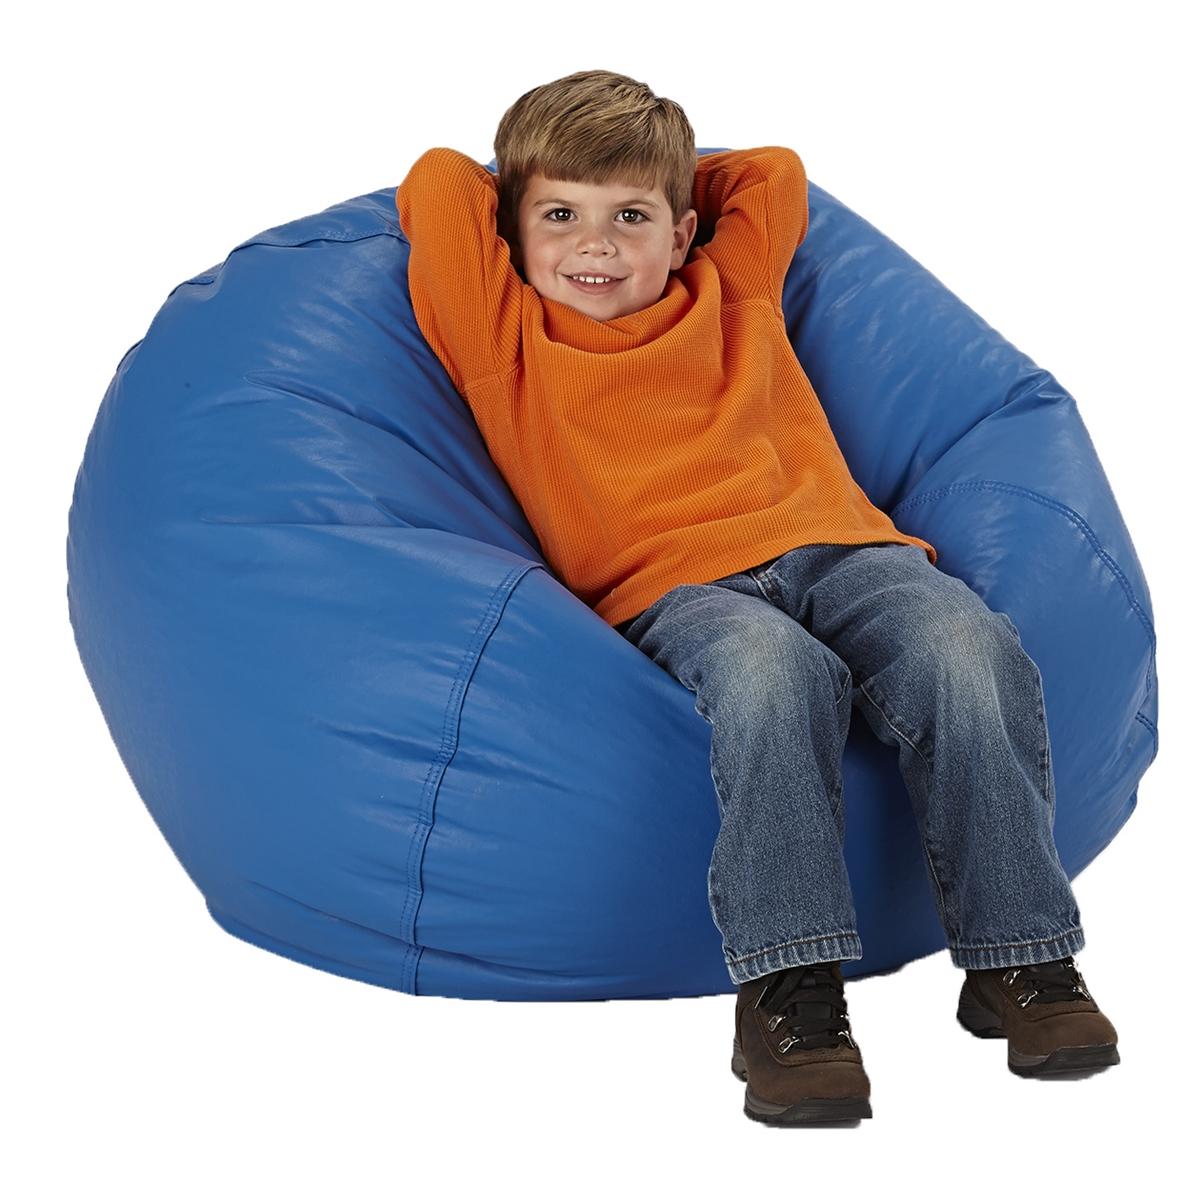 Round Bean Bag Chairs for Kids | Becker's School Supplies